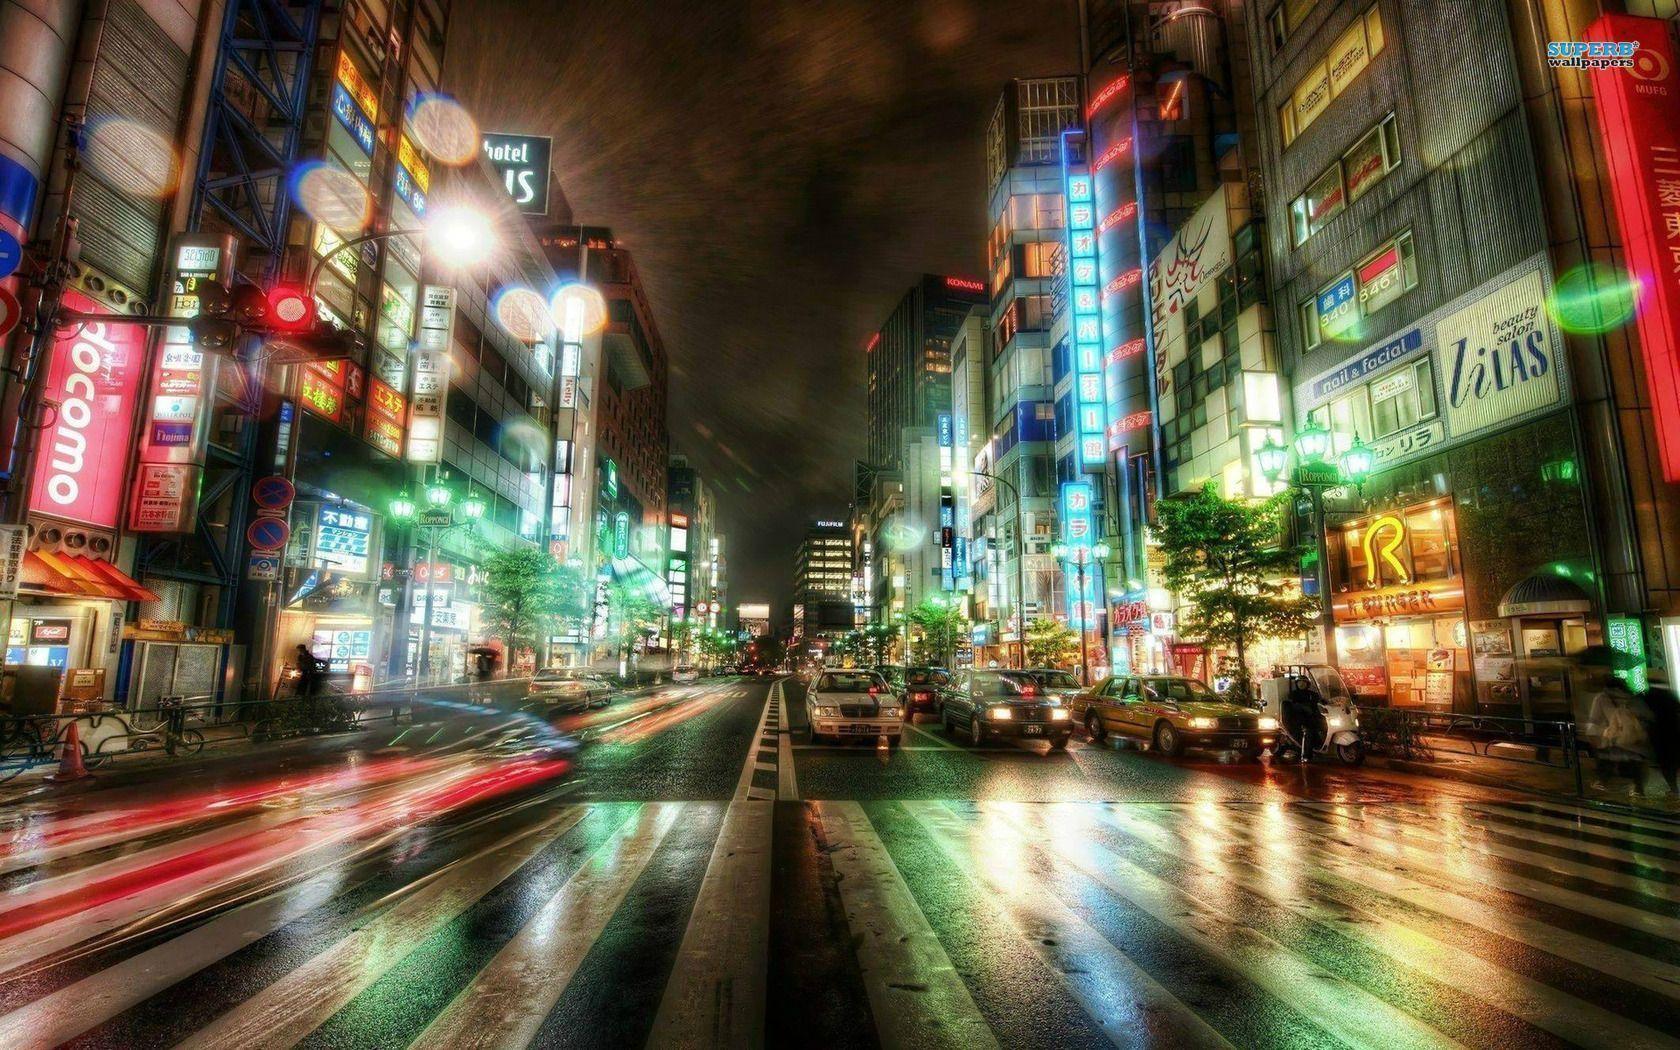 Tokyo wallpaper - World wallpapers - #